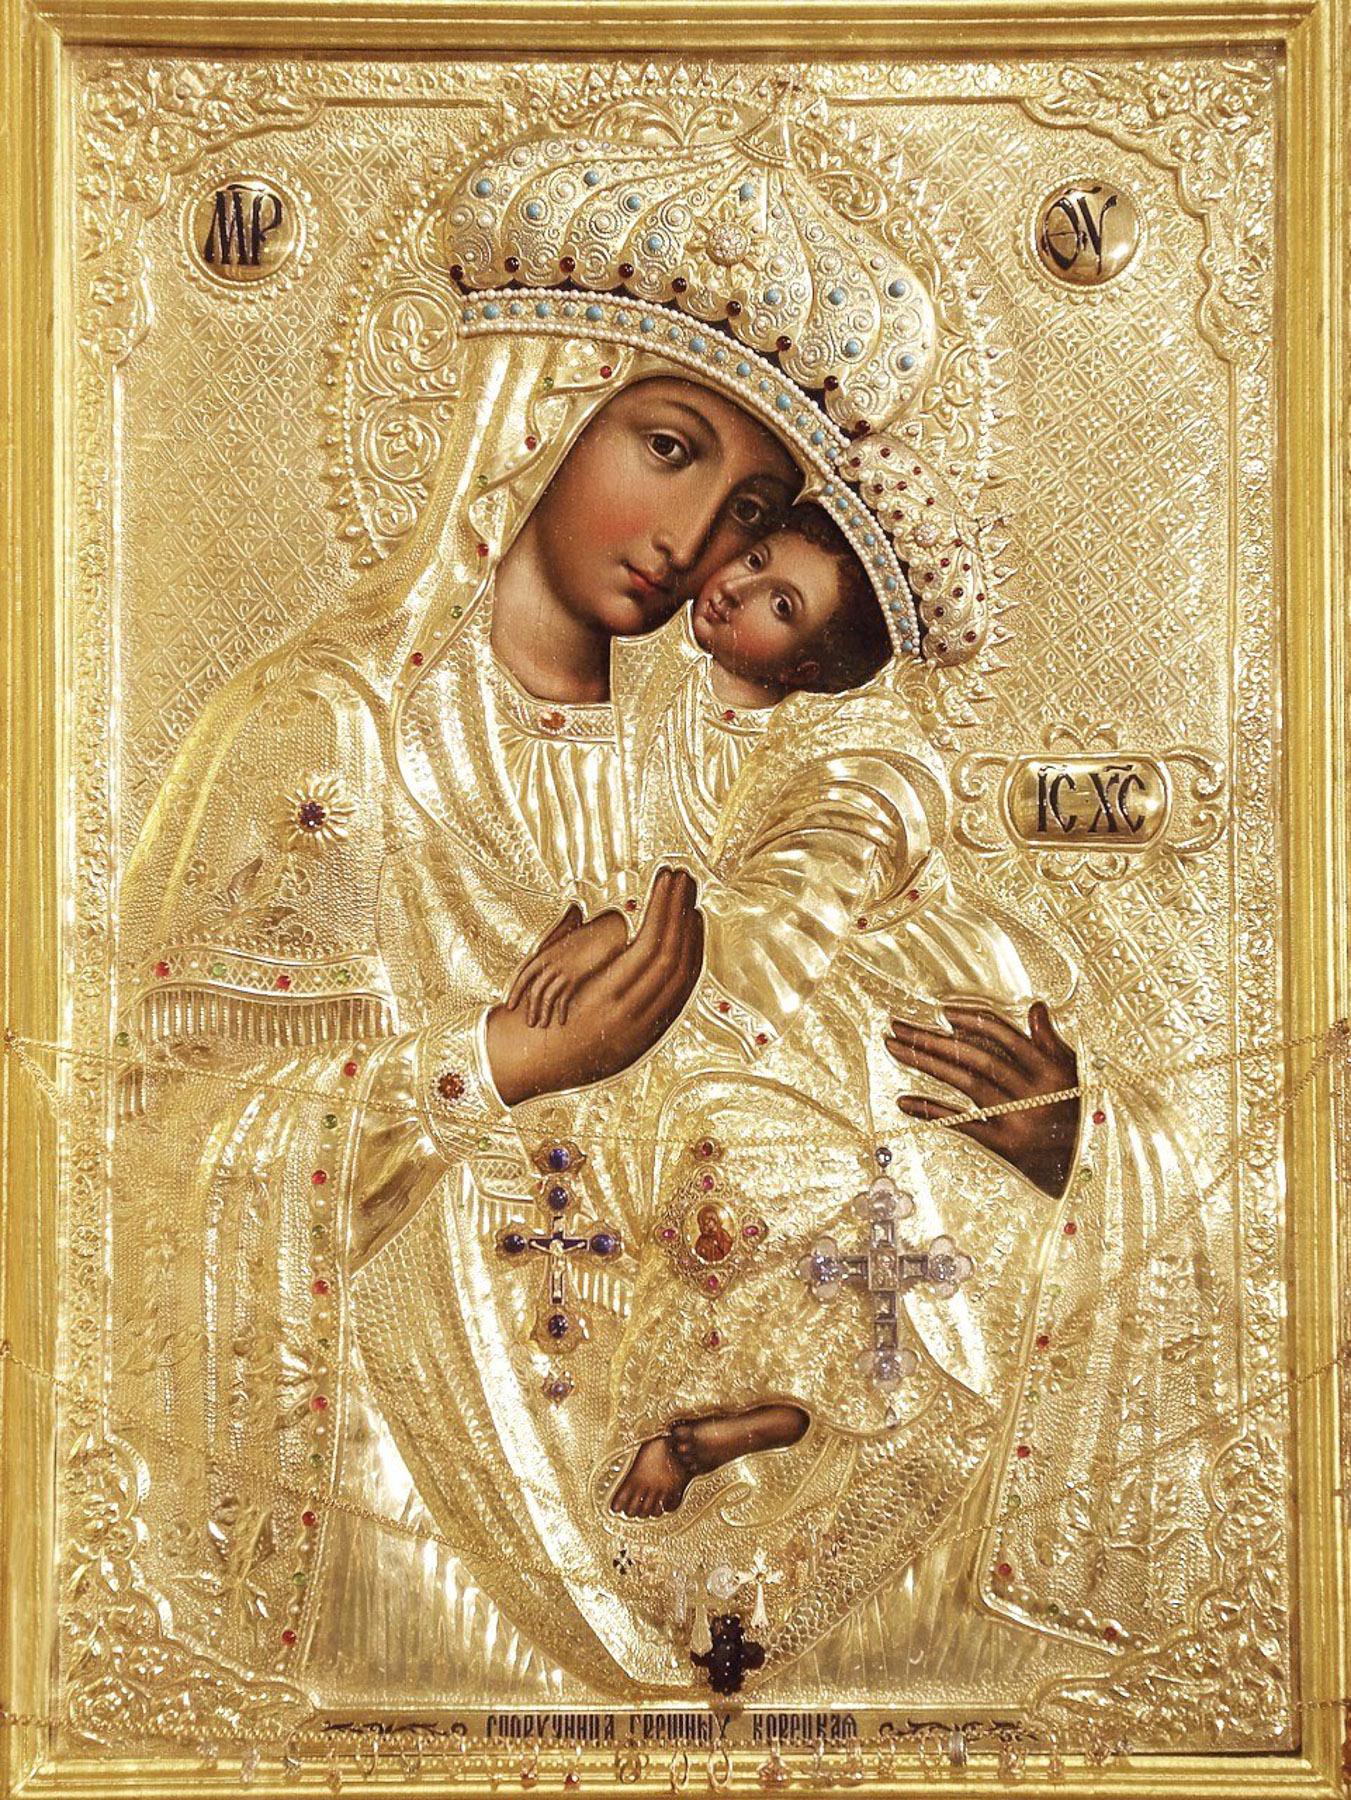 holy trinity koretsky staropigial zhensky monastry areacreativ 001